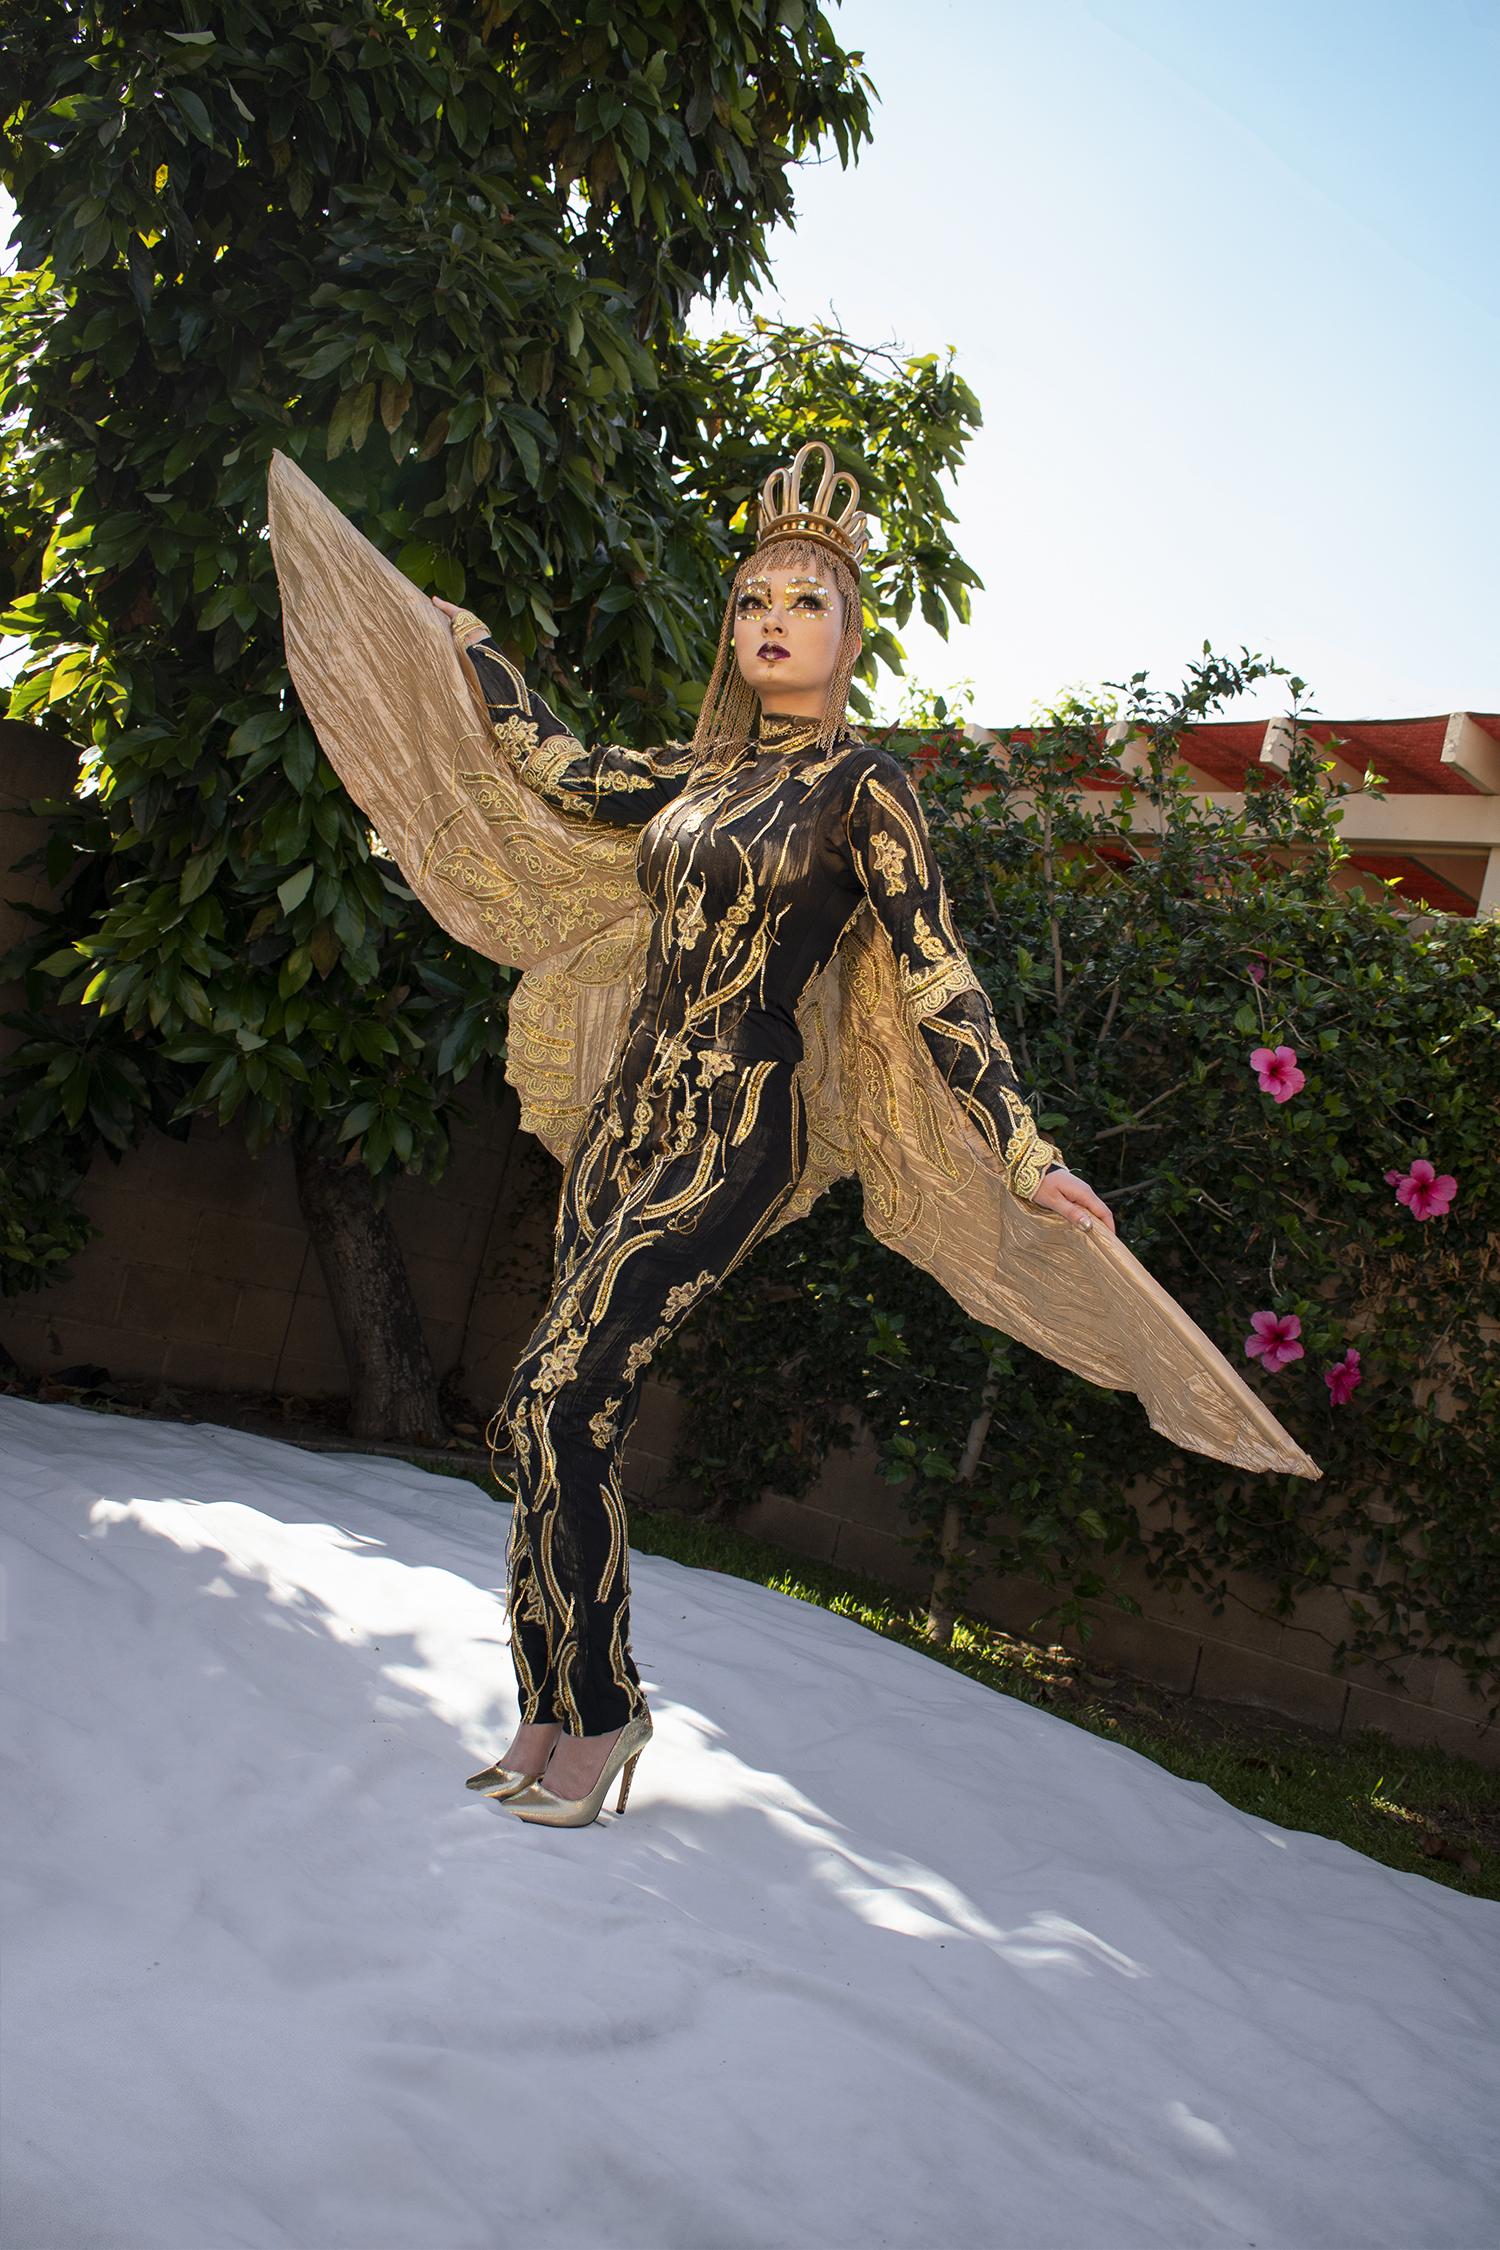 Billy Porter Met Gala 2019 Look Recreated by Designer Heather Spears